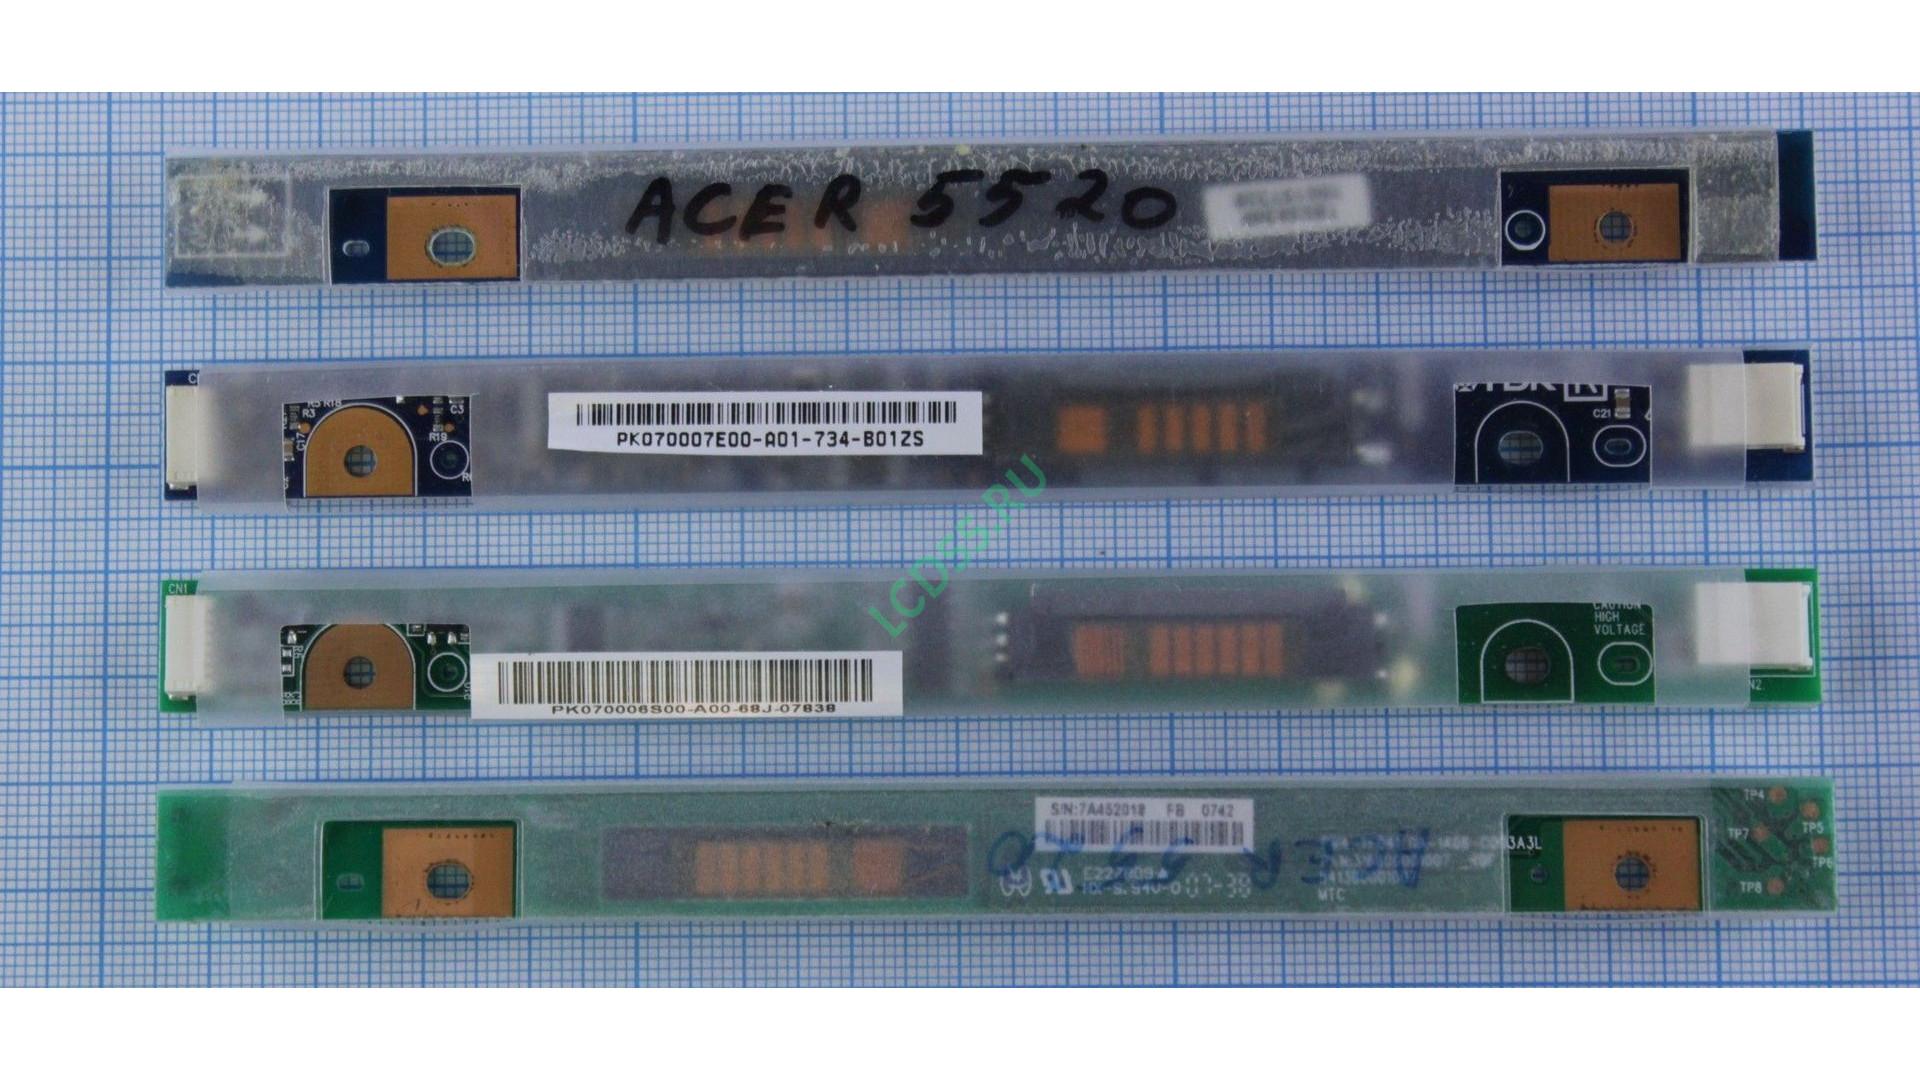 Инвертор Acer aspire 3690, 5680, 5520, 5100, 5110, HP 530, Compaq G7000, C500, C700